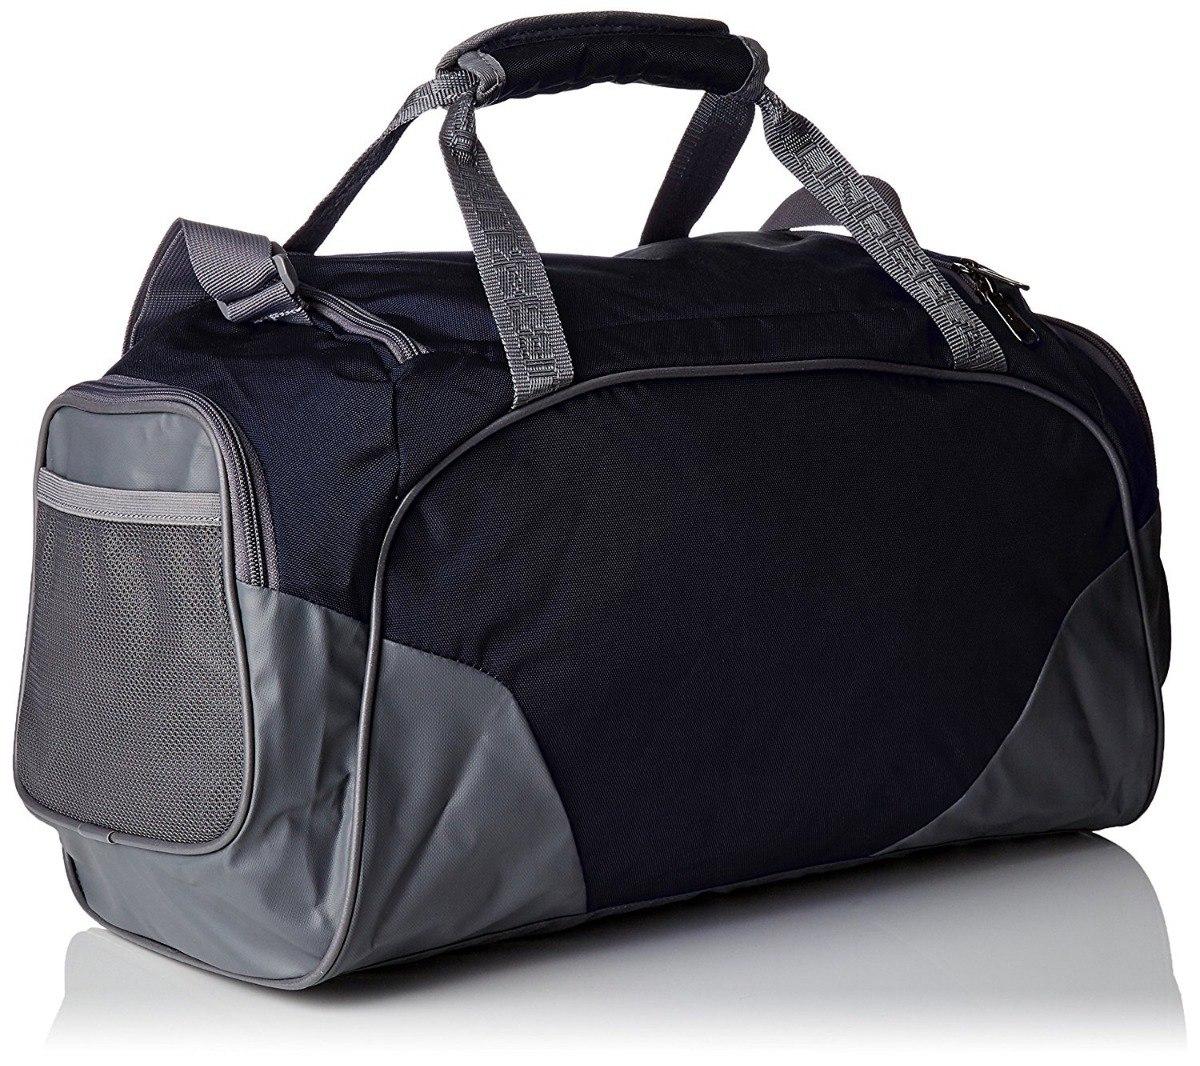 maletas deportivas para gym under armour originales. Cargando zoom. 1ffa45747835e